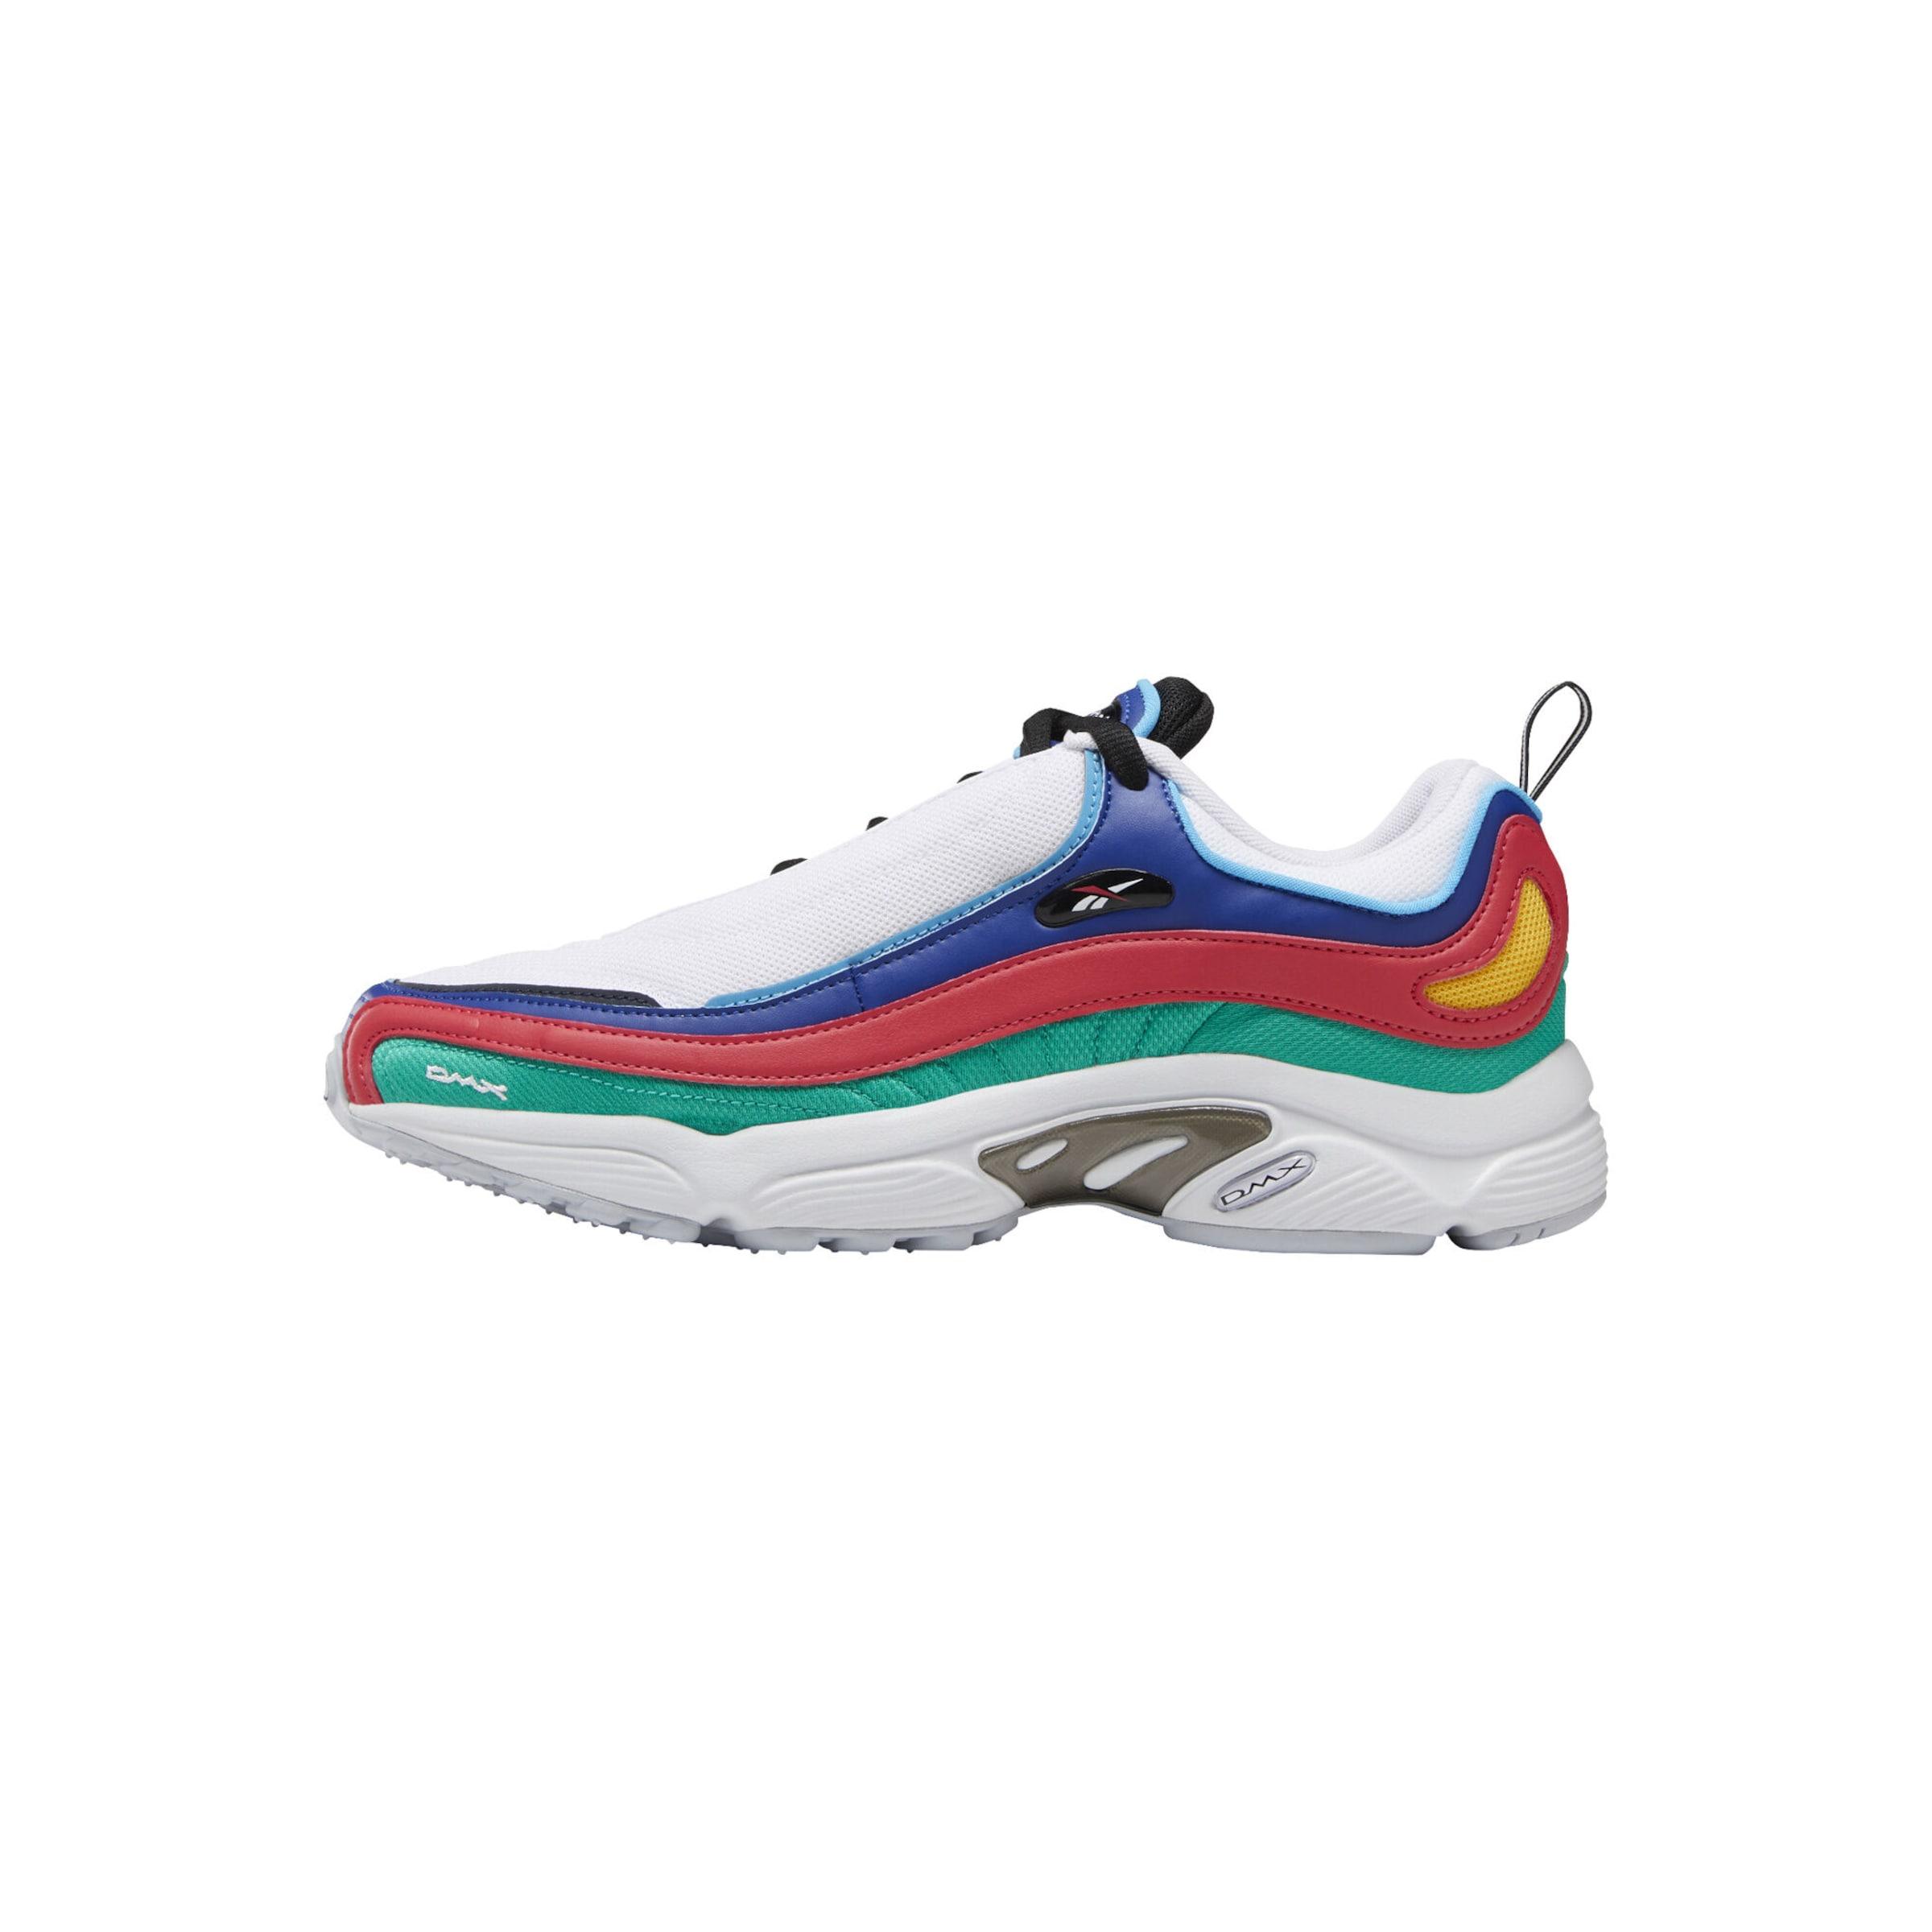 Reebok Classic In Weiß Sneaker BlauRot dxsQrohCBt